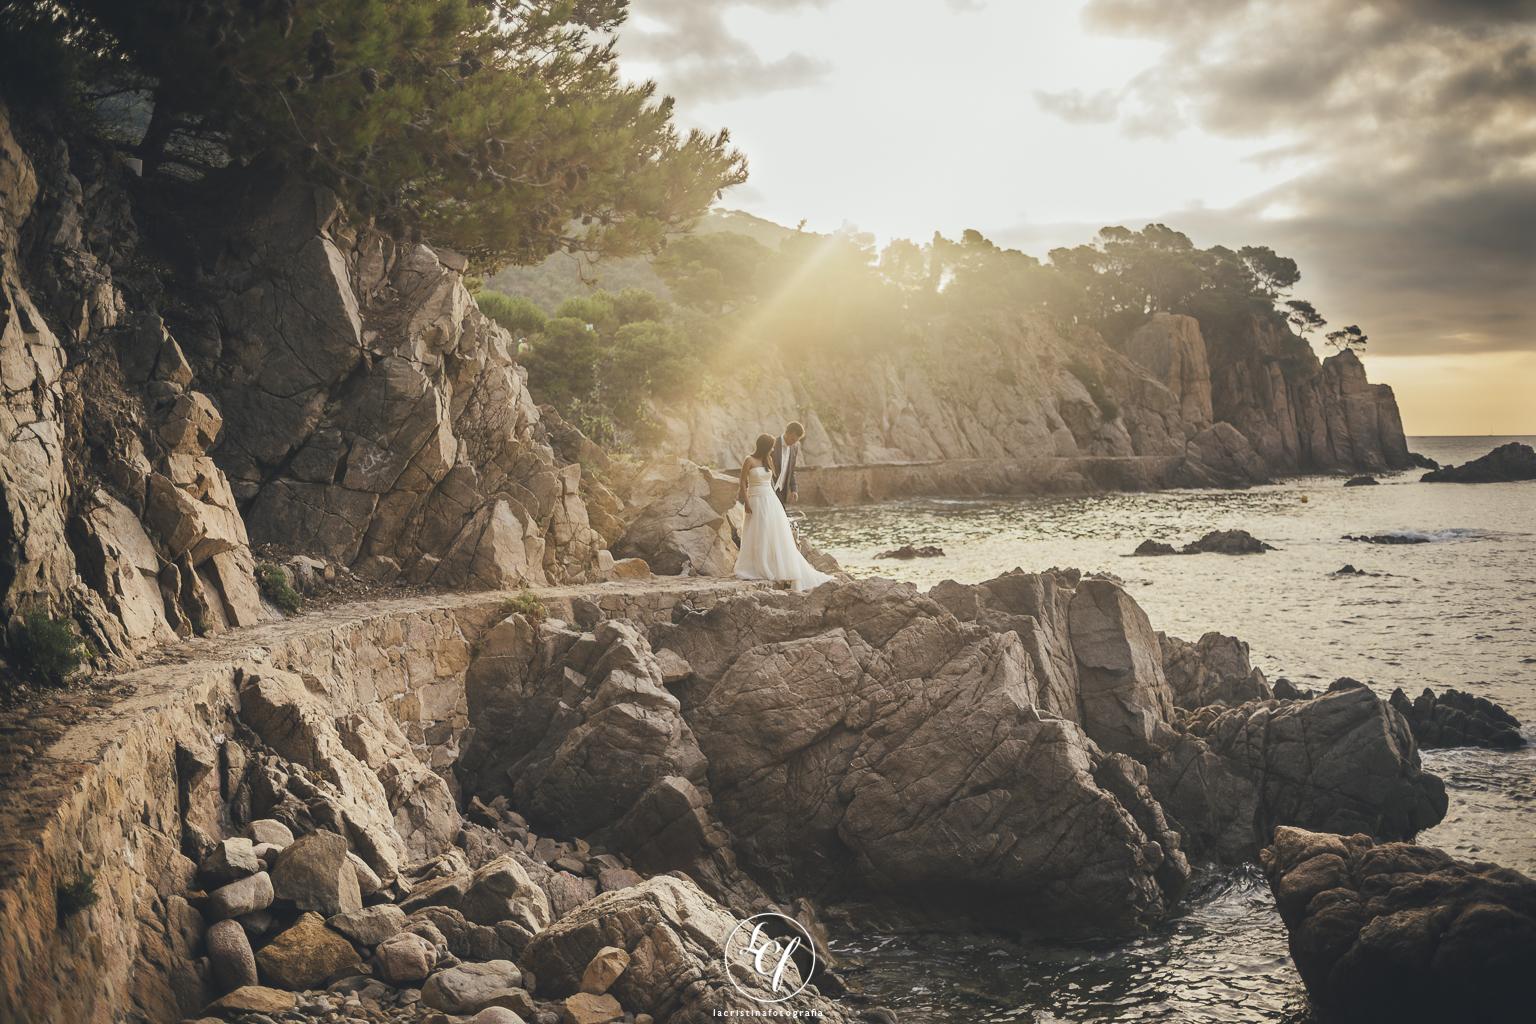 fotógrafo boda barcelona :: postboda :: postboda girona :: costa brava :: rosamar :: pontets de rosamar :: novios en la playa